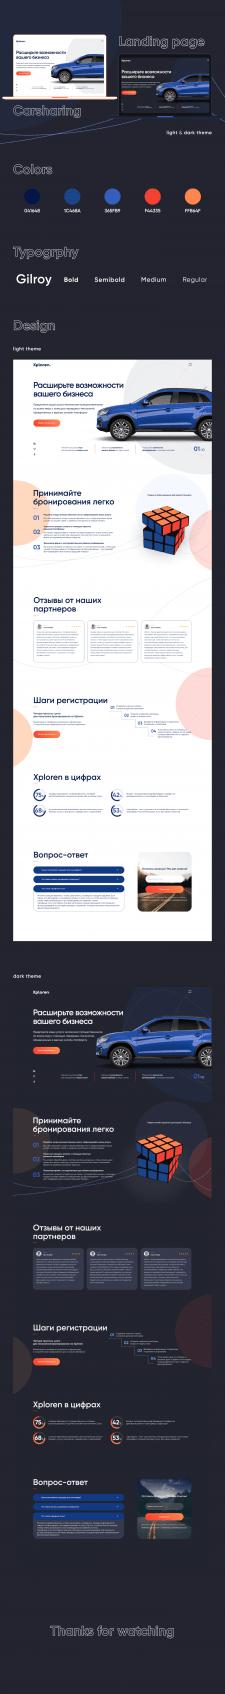 Landing page for carsharing Xplorer